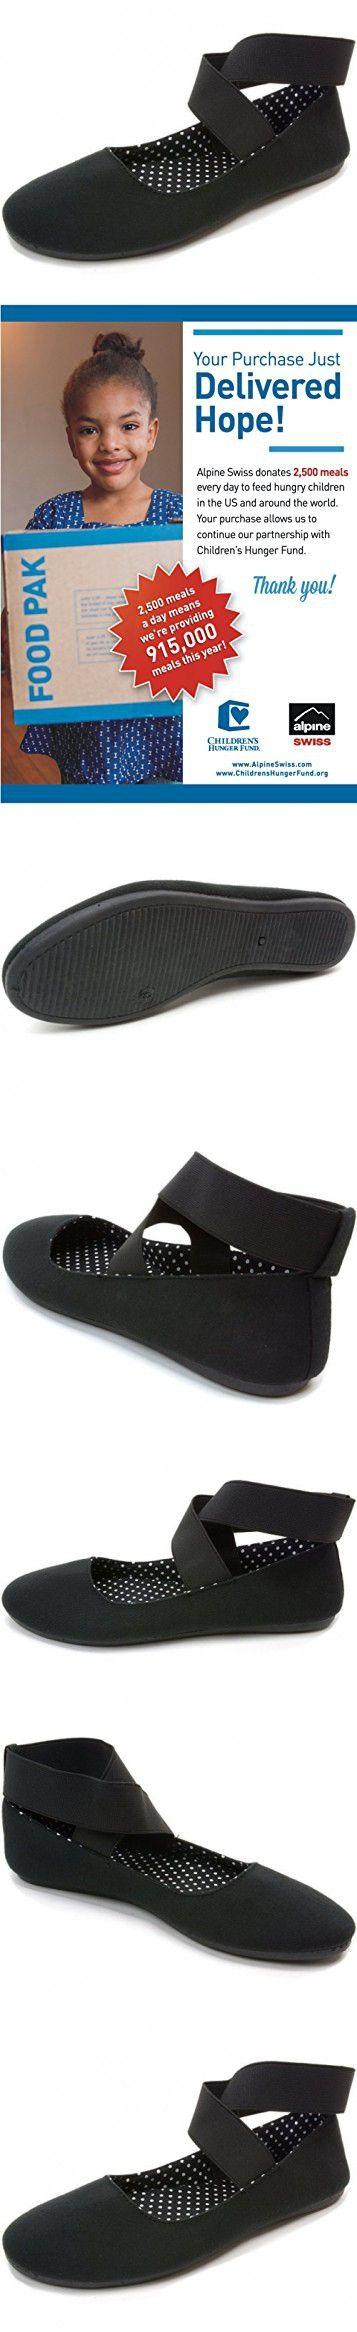 Alpine Swiss Peony Womens Ballet Flats Elastic Ankle Strap Shoes Black 9 M US